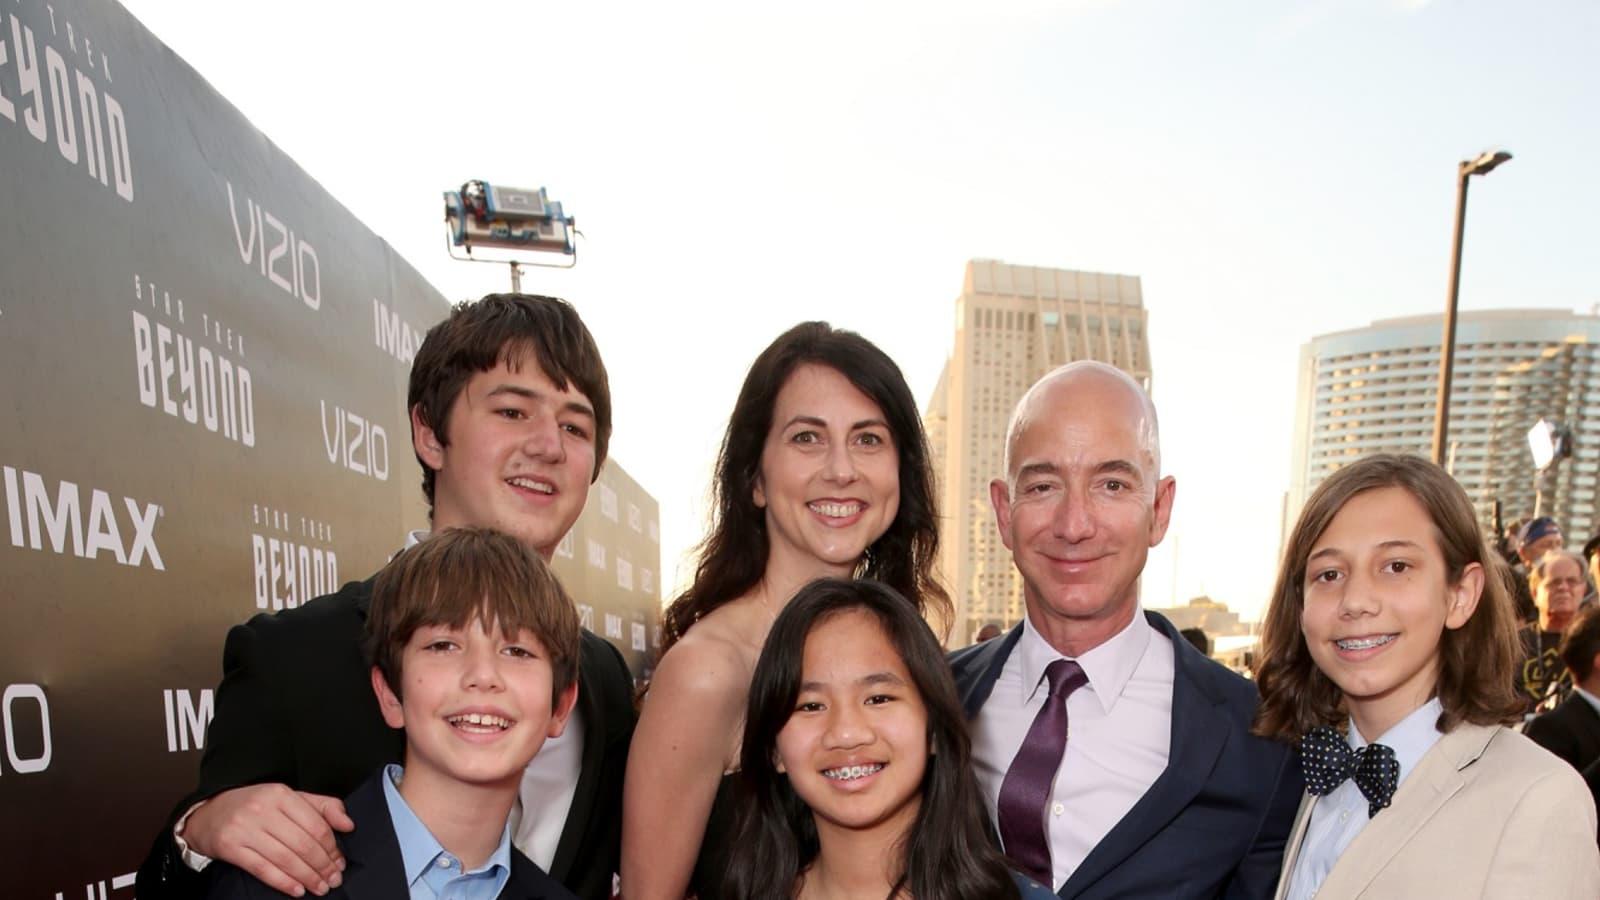 Jeff Bezos Net Worth, Lifestyle, Girlfriend, Wiki, Family And More